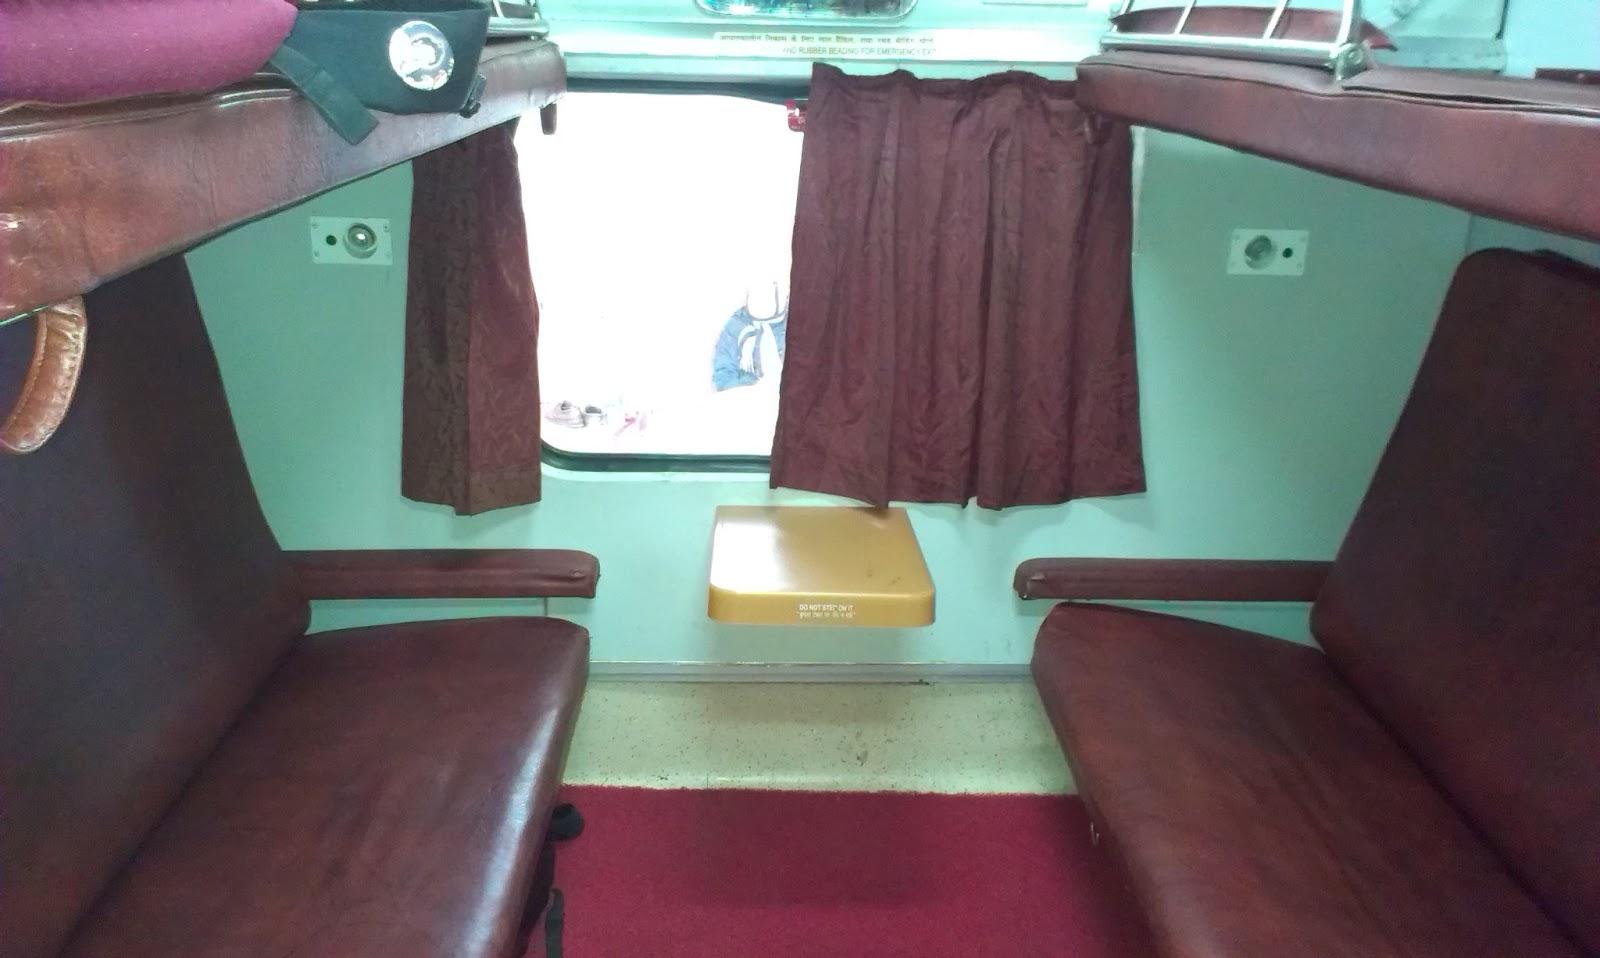 The First Ac Rajdhani Express